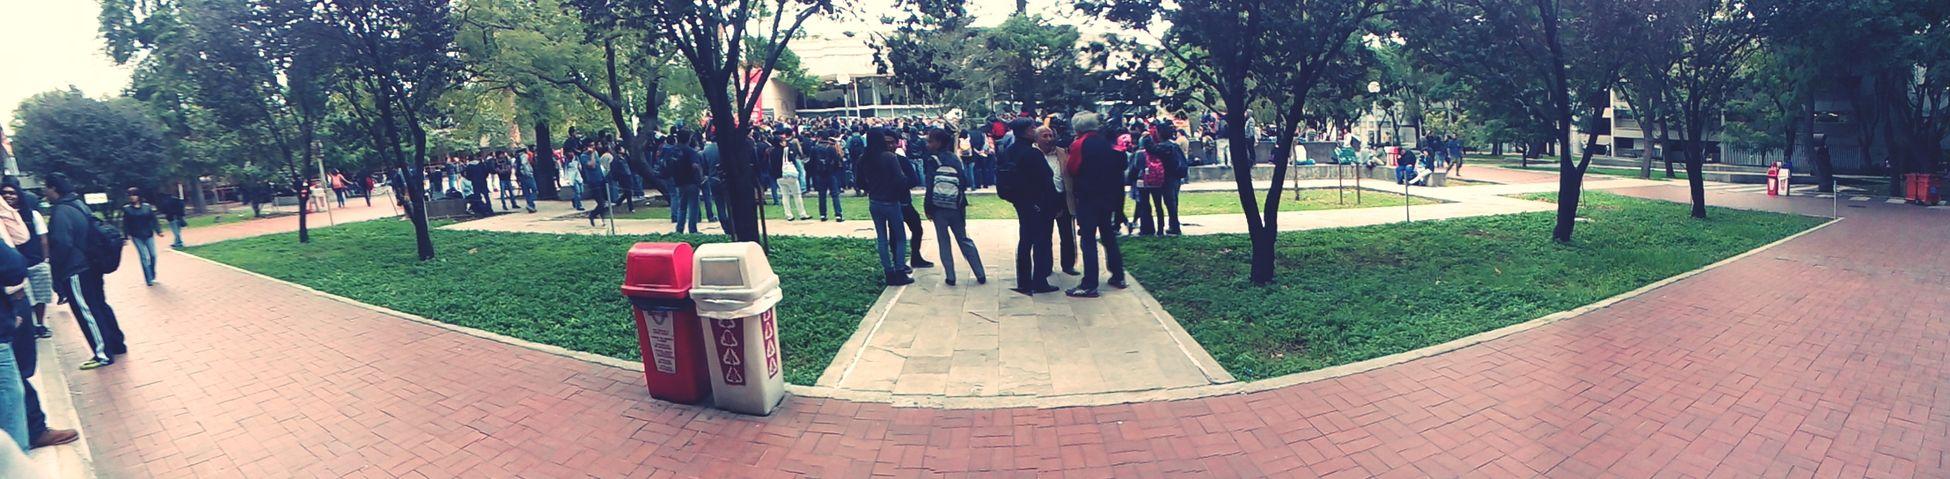 University assembly. No más muertos. Ayotzinapa vive. University Nosinfiltramosnoslevantamos Babylonfading People fighting